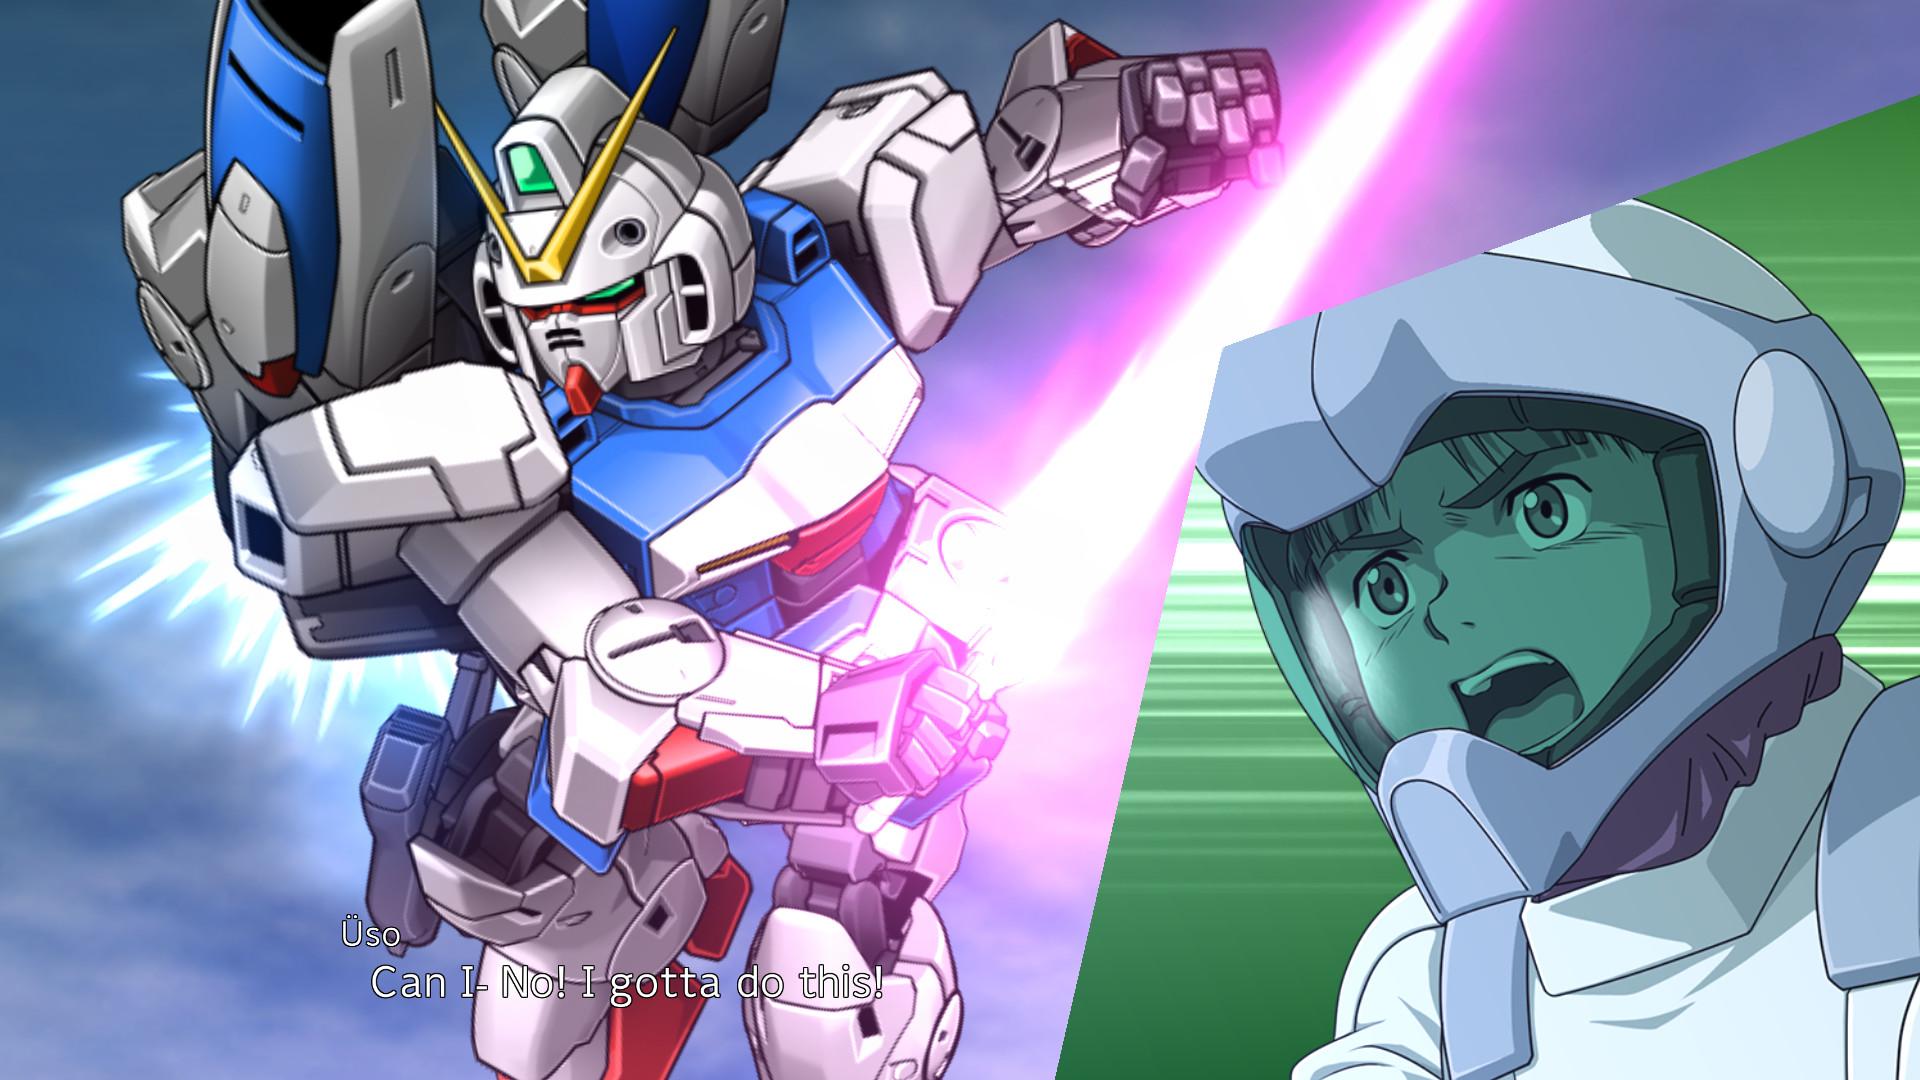 Super Robot Wars 30 Screenshot of Victory Gundam and Uso